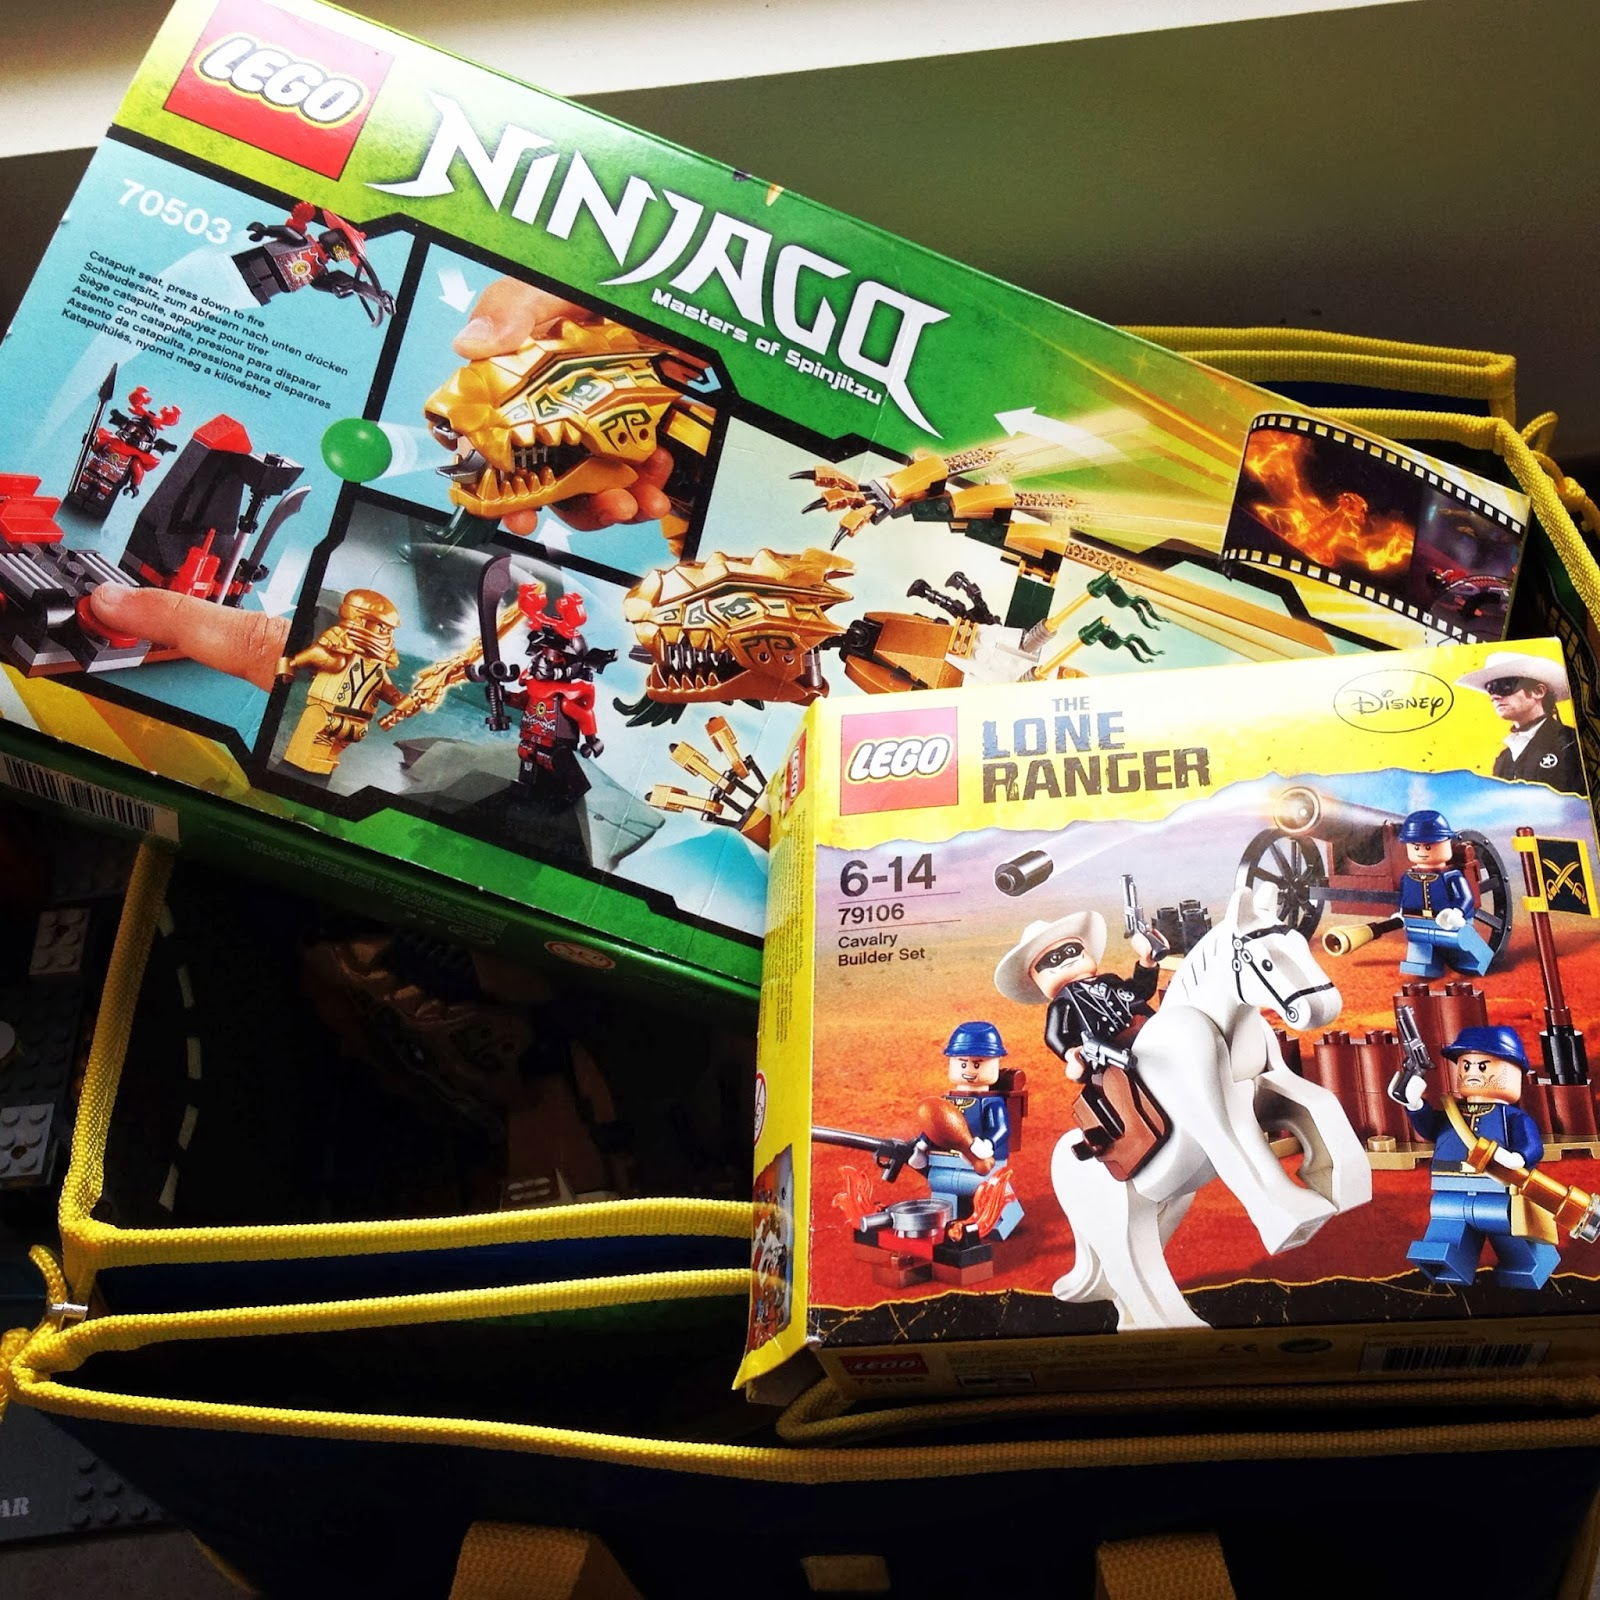 Rangements lego cacasselesbriques - Lego ninjago le grand devoreur ...